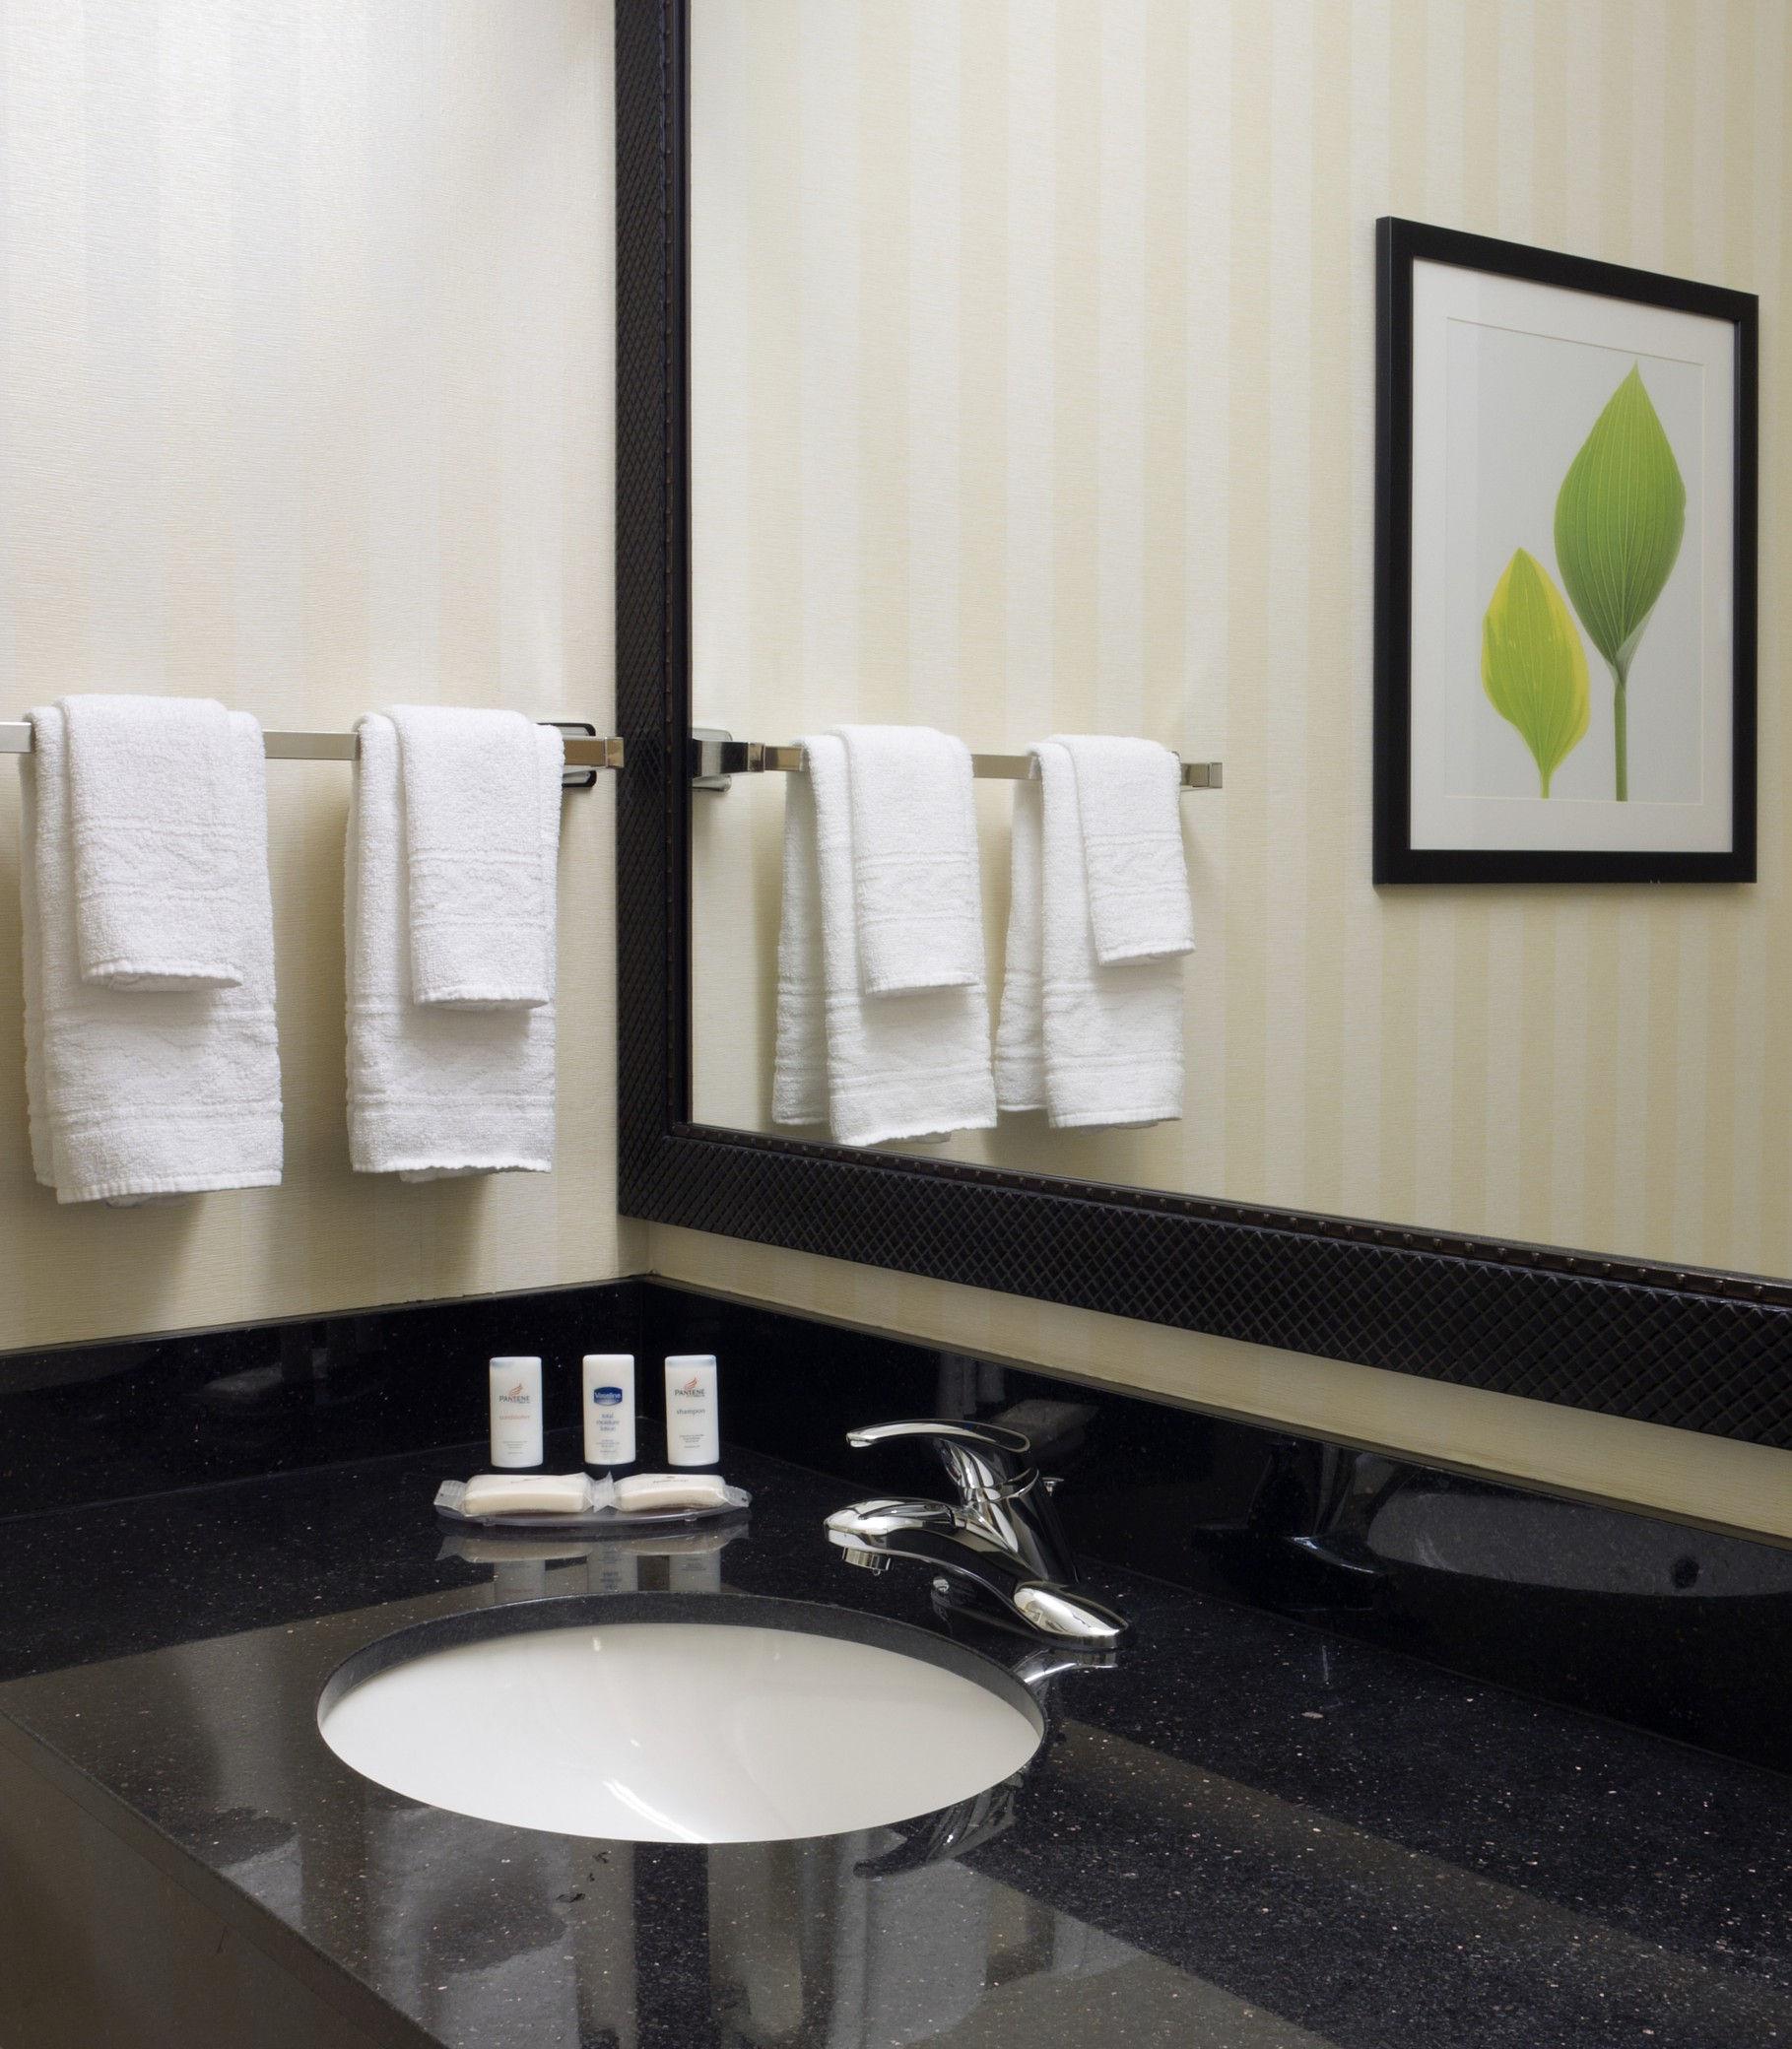 Fairfield Inn & Suites by Marriott Tacoma Puyallup image 2